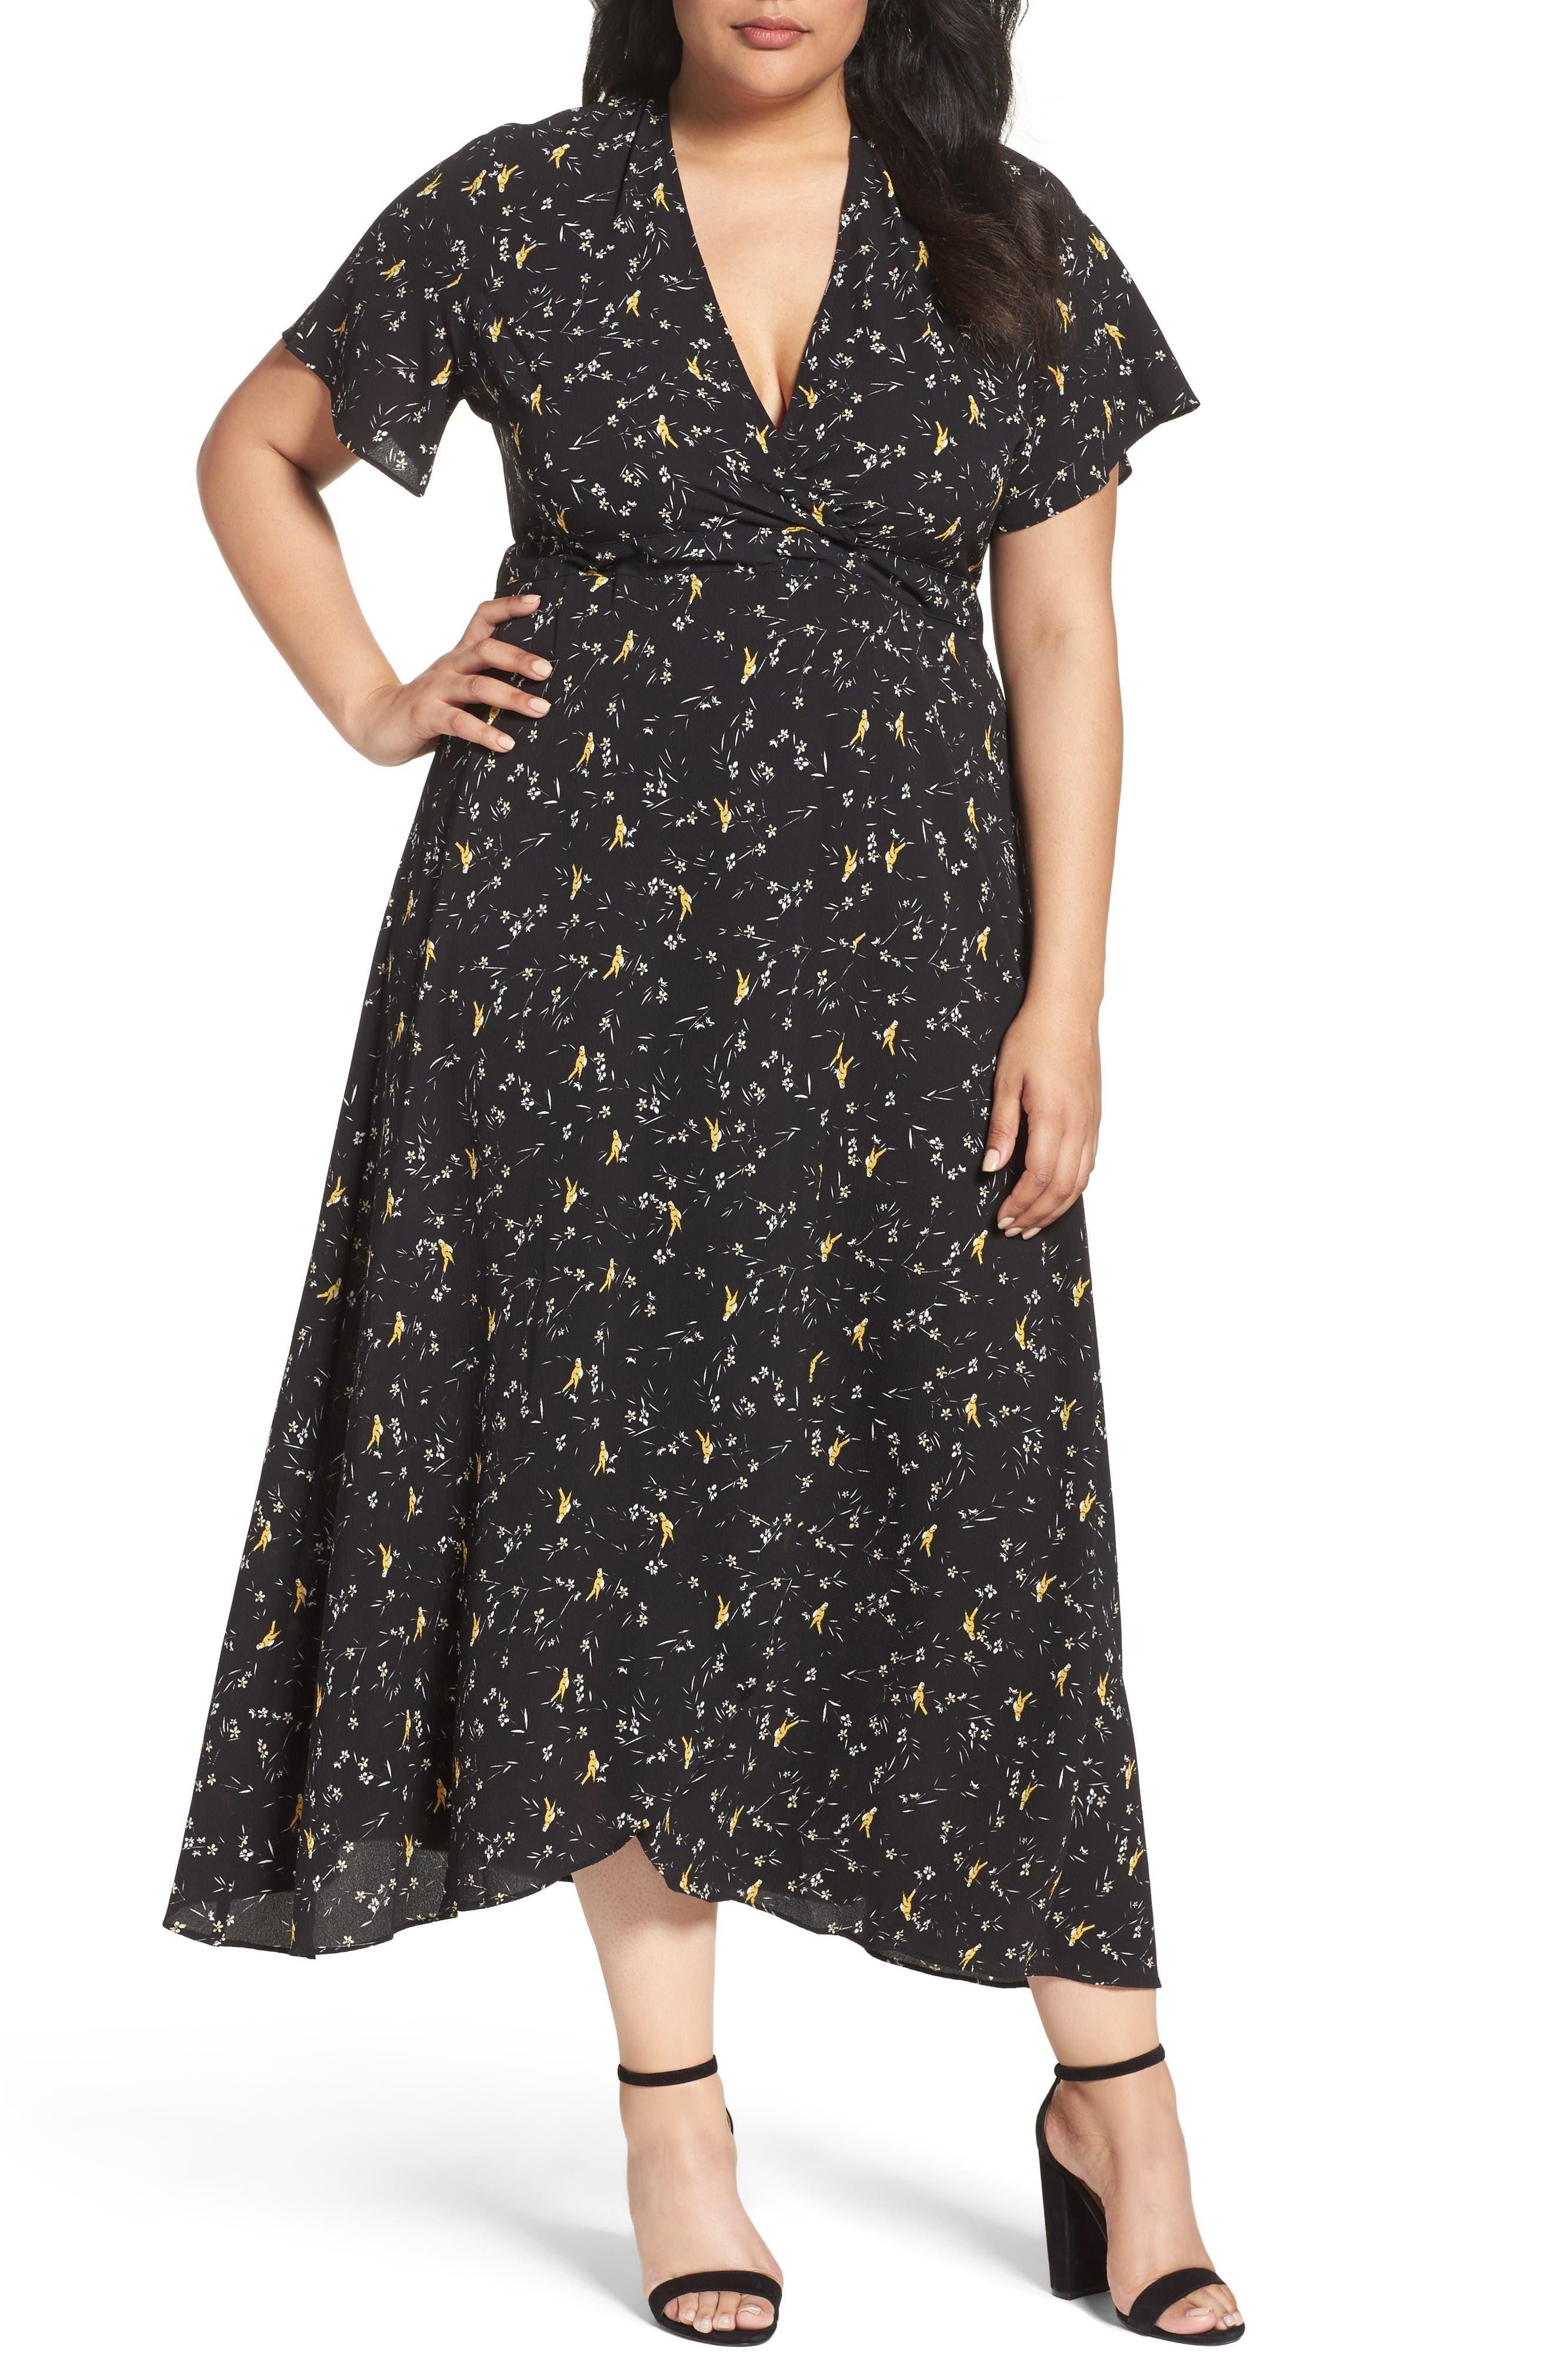 Alternate Image 1 Selected - Glamorous Print Maxi Dress (Plus Size)